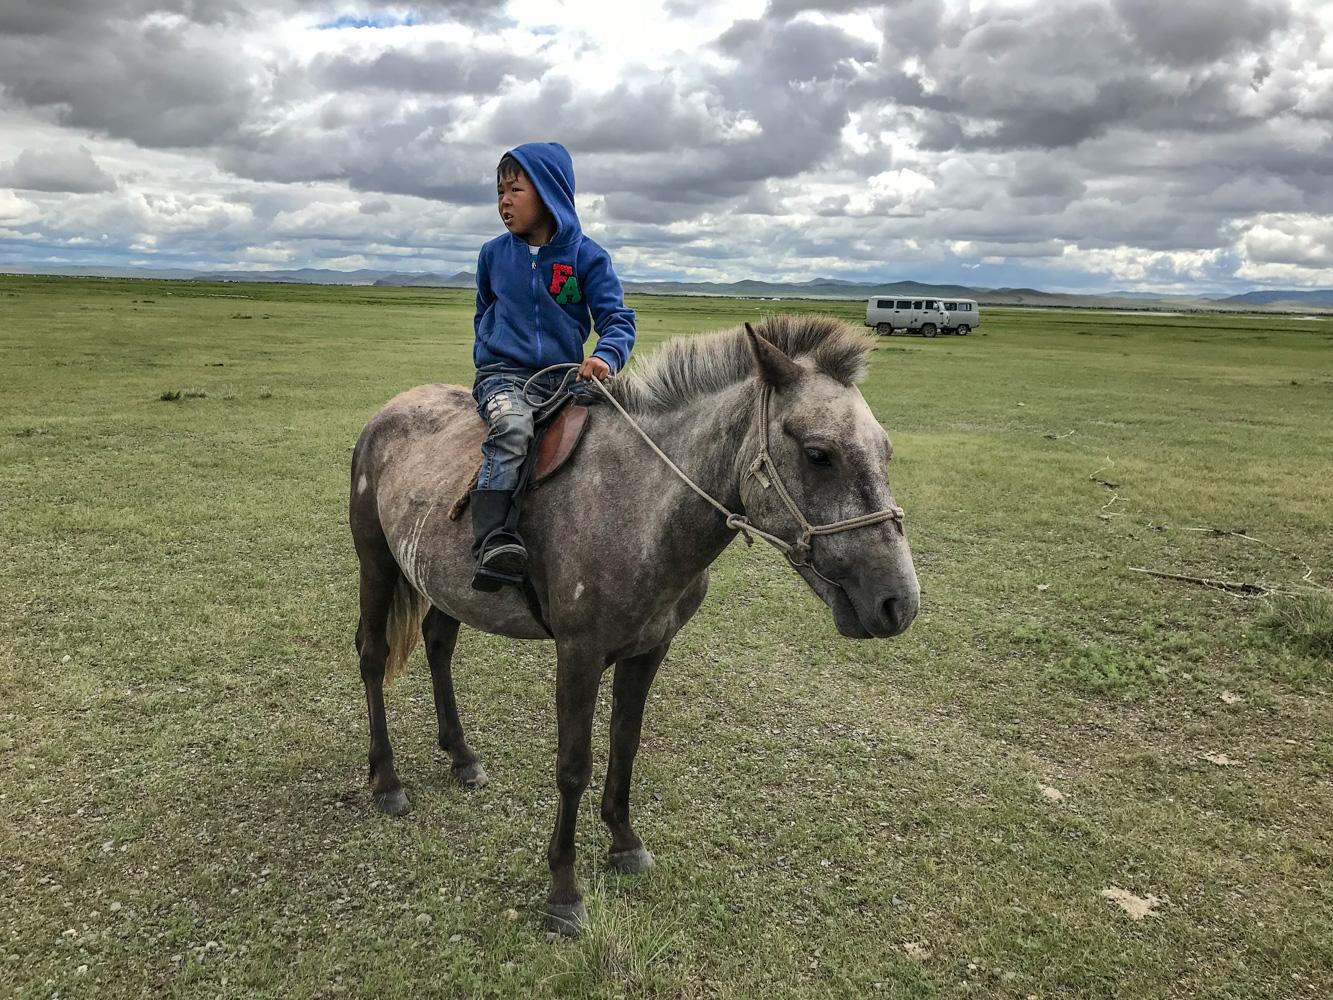 Mongolie - Parc national de Khustai (Charlie Marlot)